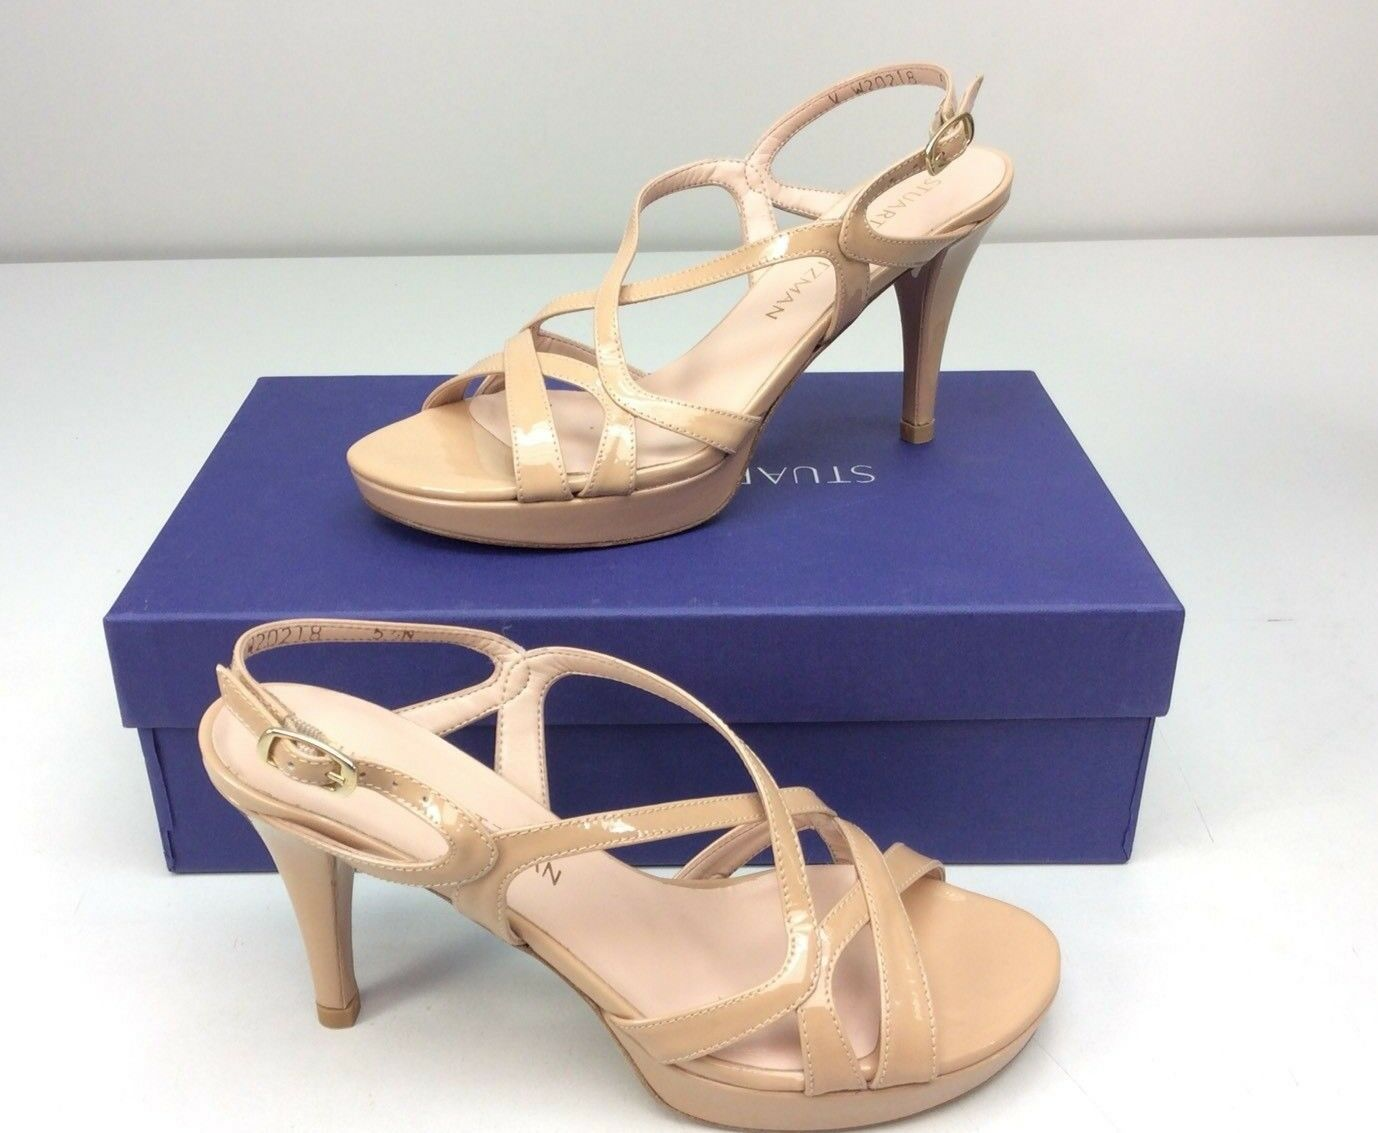 Stuart Weitzman Axis Platform Sandal Heel Adobe Patent Dimensione 5.5 N Narrow Strappy